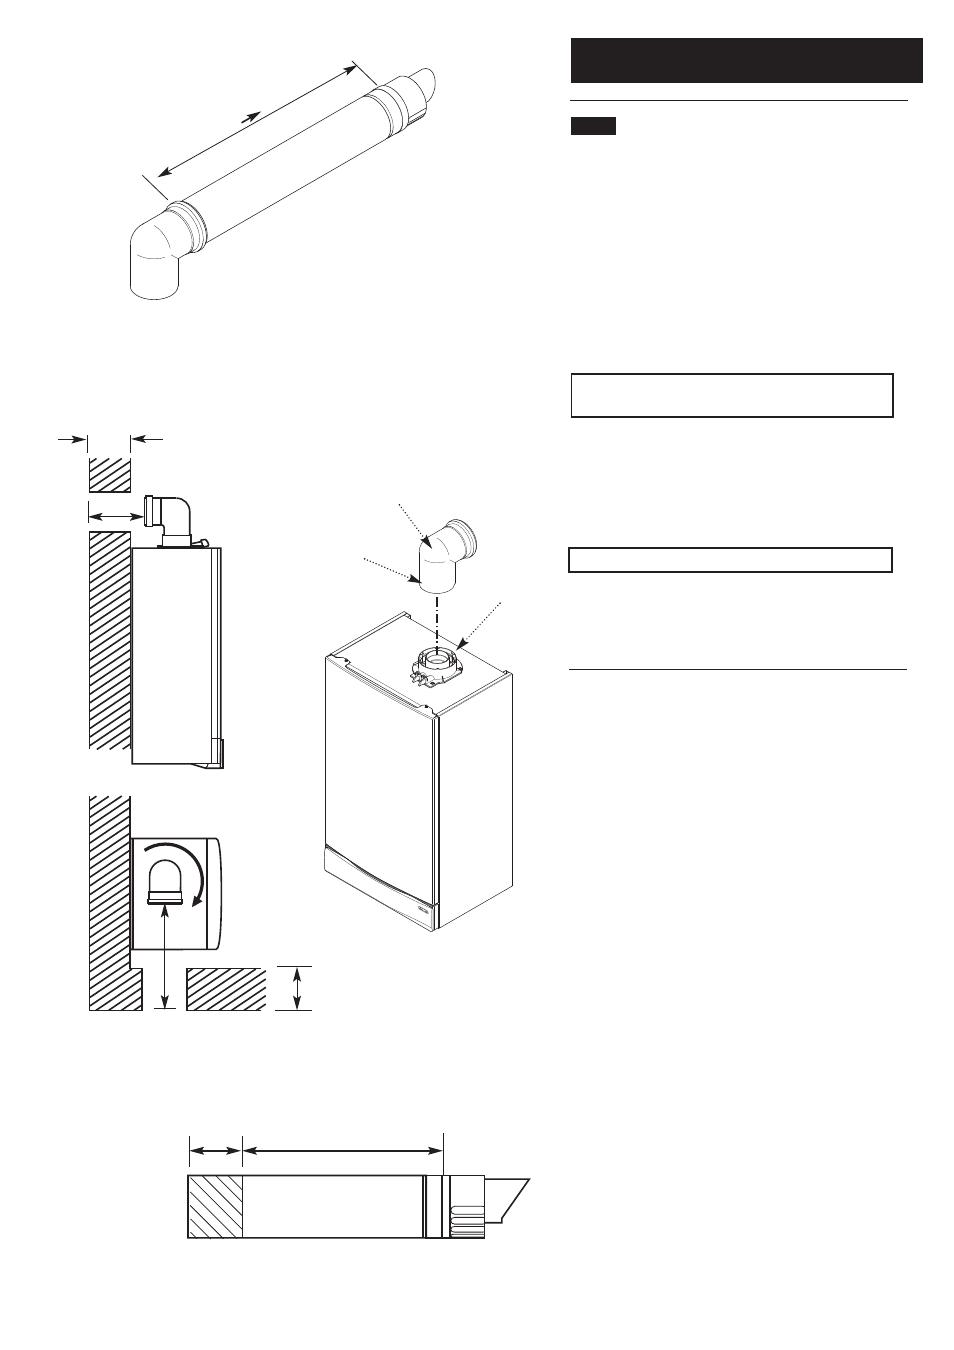 0 installation baxi potterton heatmax combi he condensing 0 installation baxi potterton heatmax combi he condensing combination boiler user manual page 31 asfbconference2016 Images